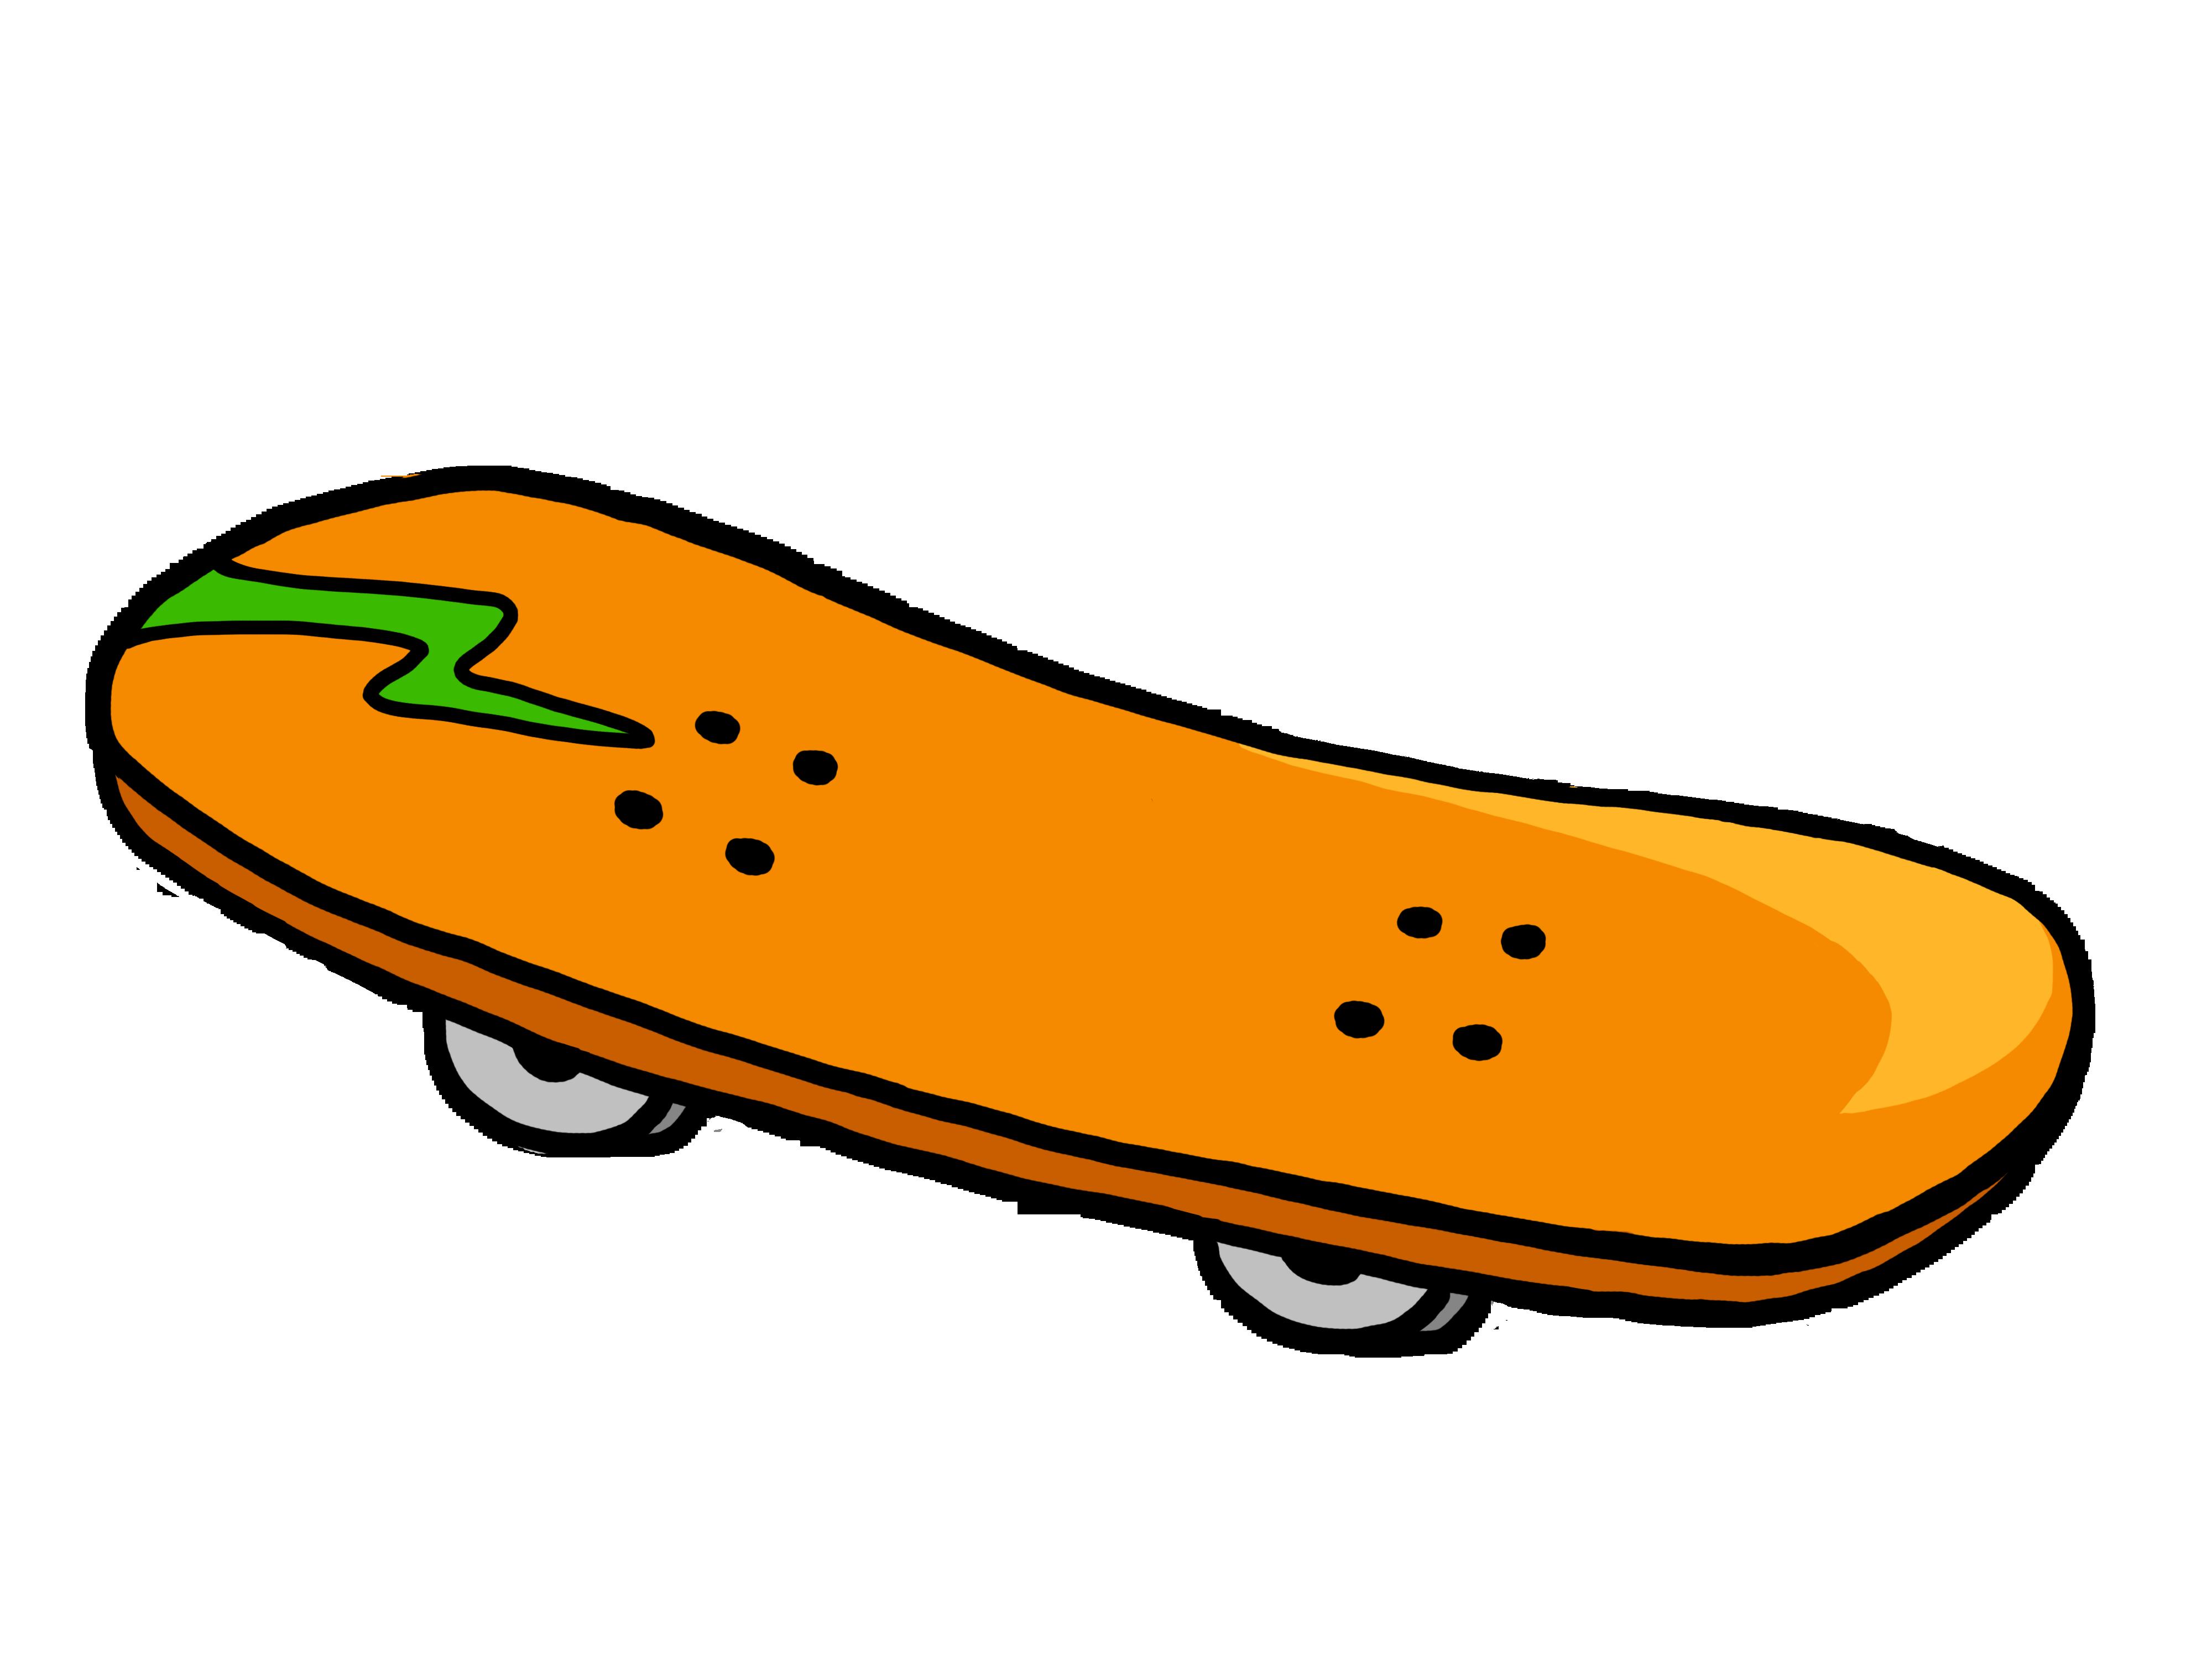 Skateboard clipart Clipart Clipart skateboard Clipart clipart